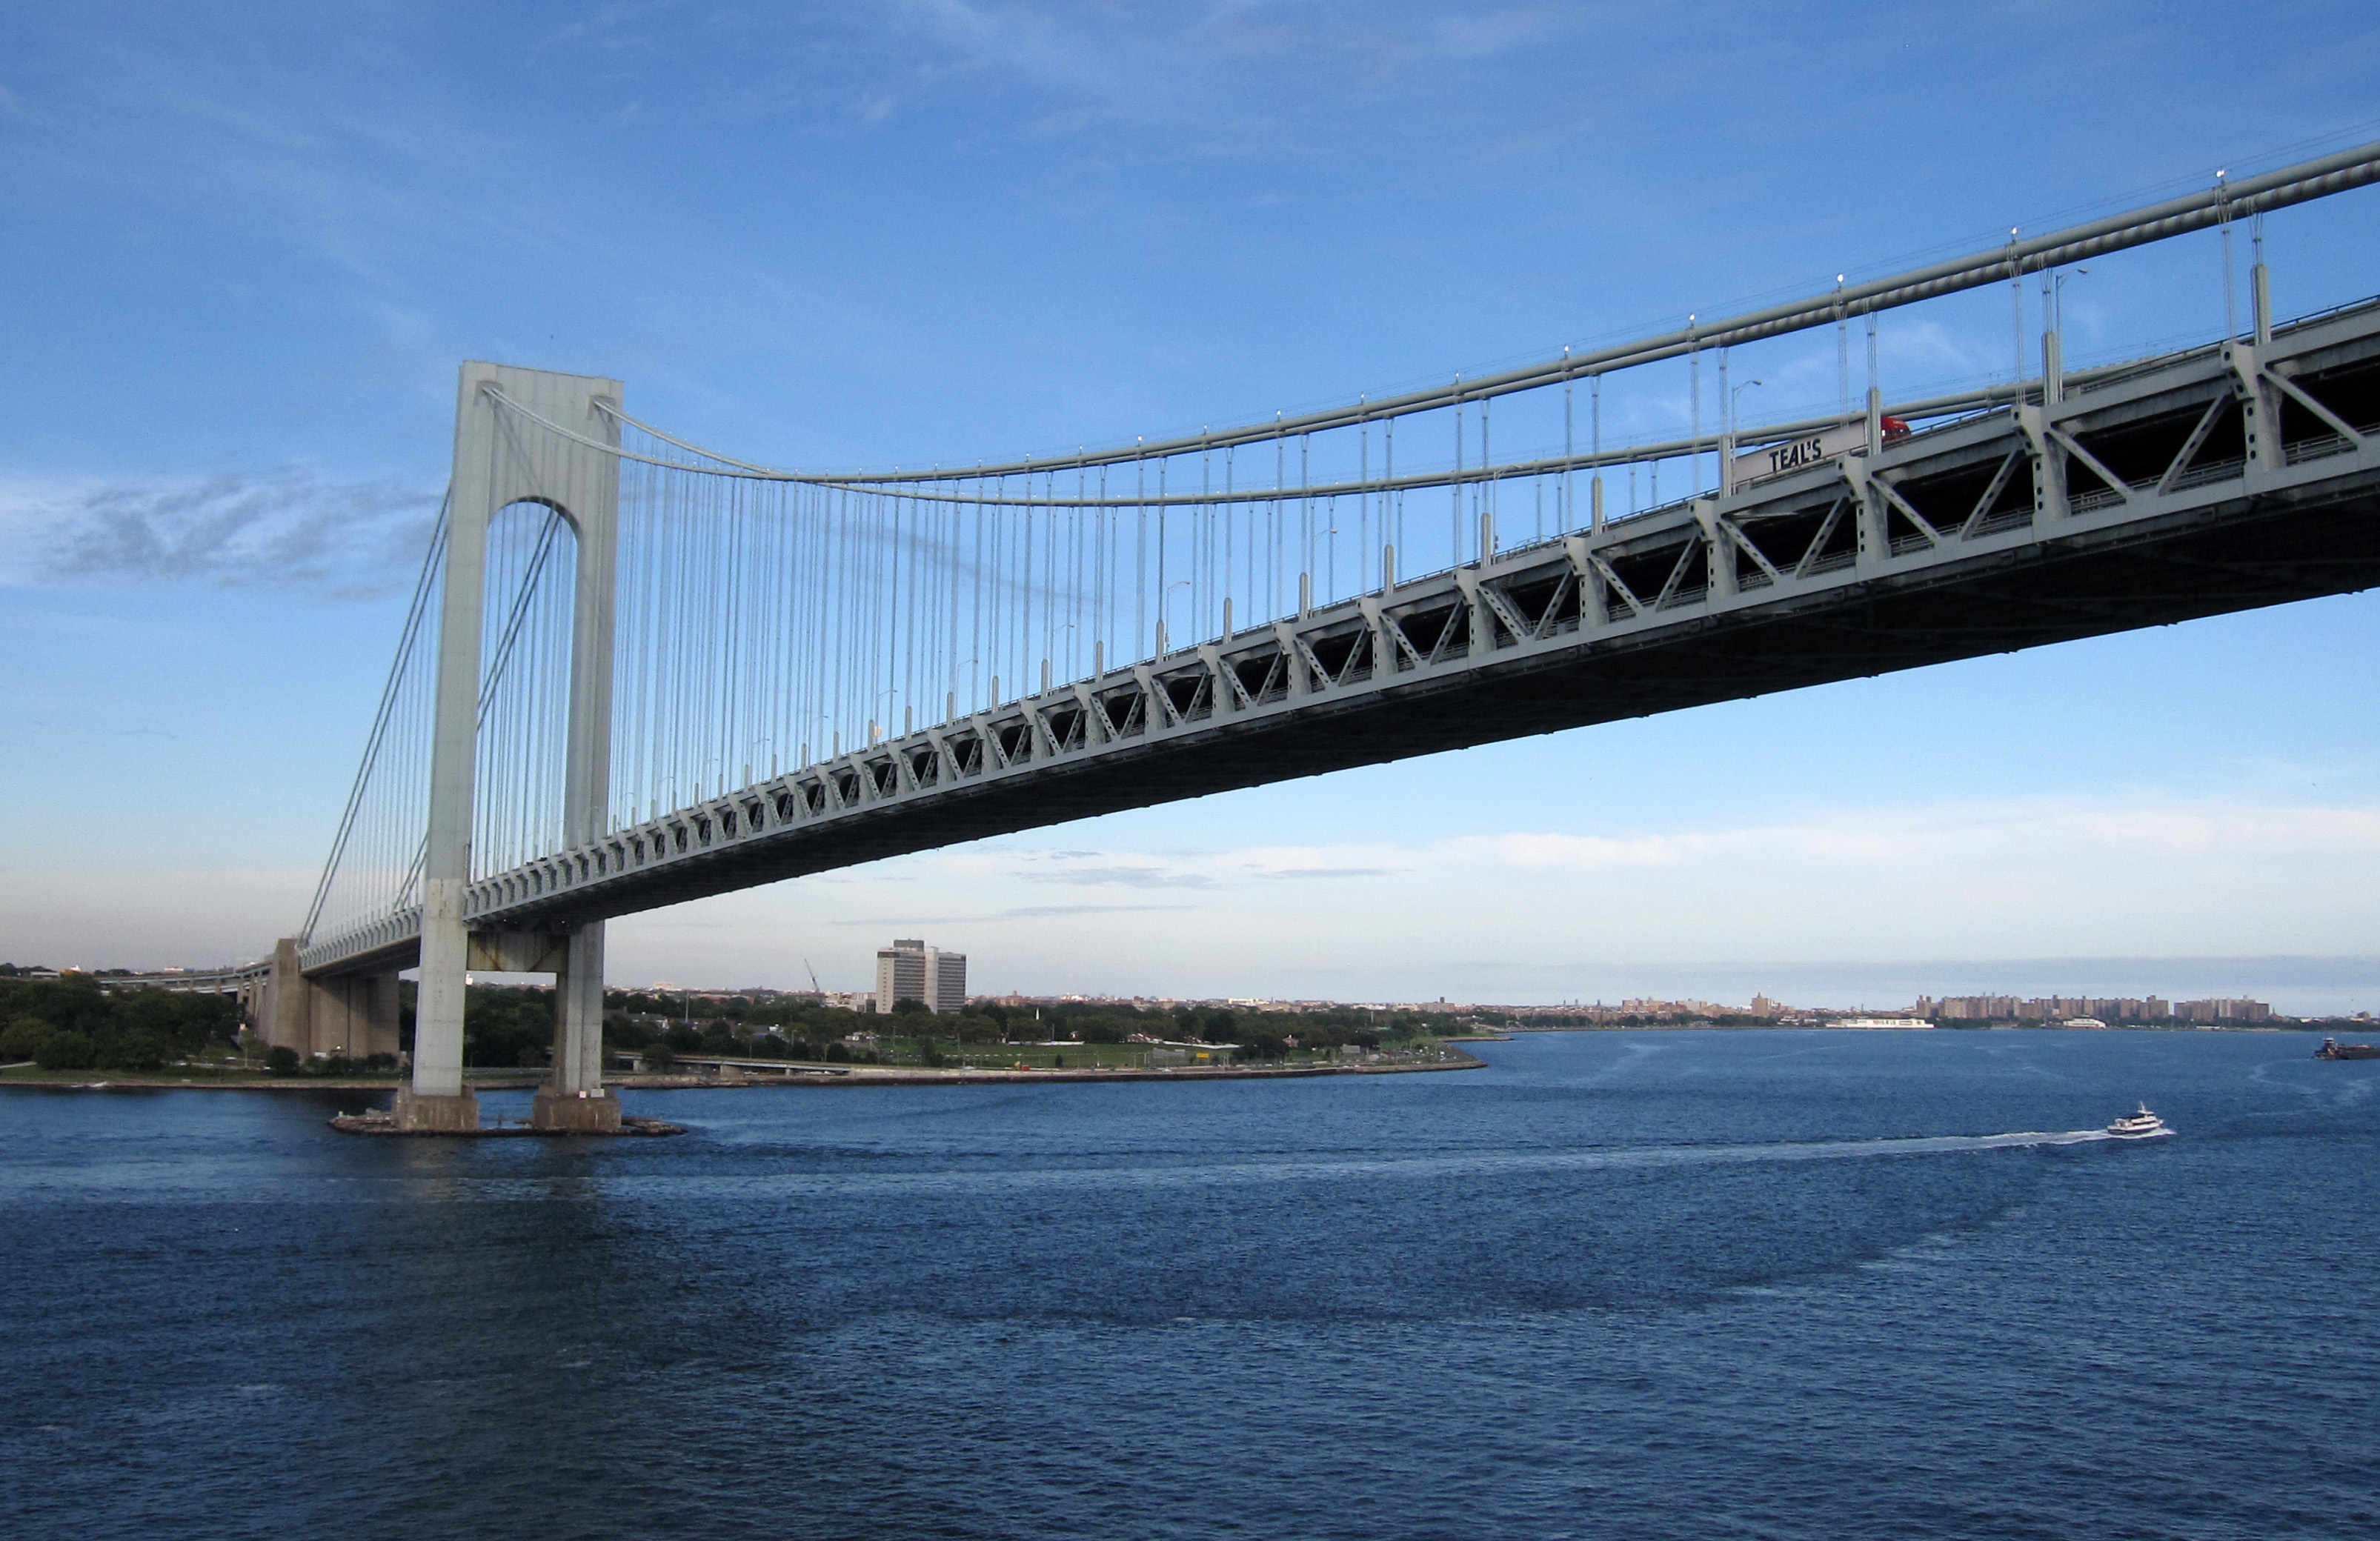 verrazano bridge Verrazano-narrows bridge, new york, new york 7,898 likes 170,707 were here the verrazano-narrows bridge is a double-decked suspension bridge that.